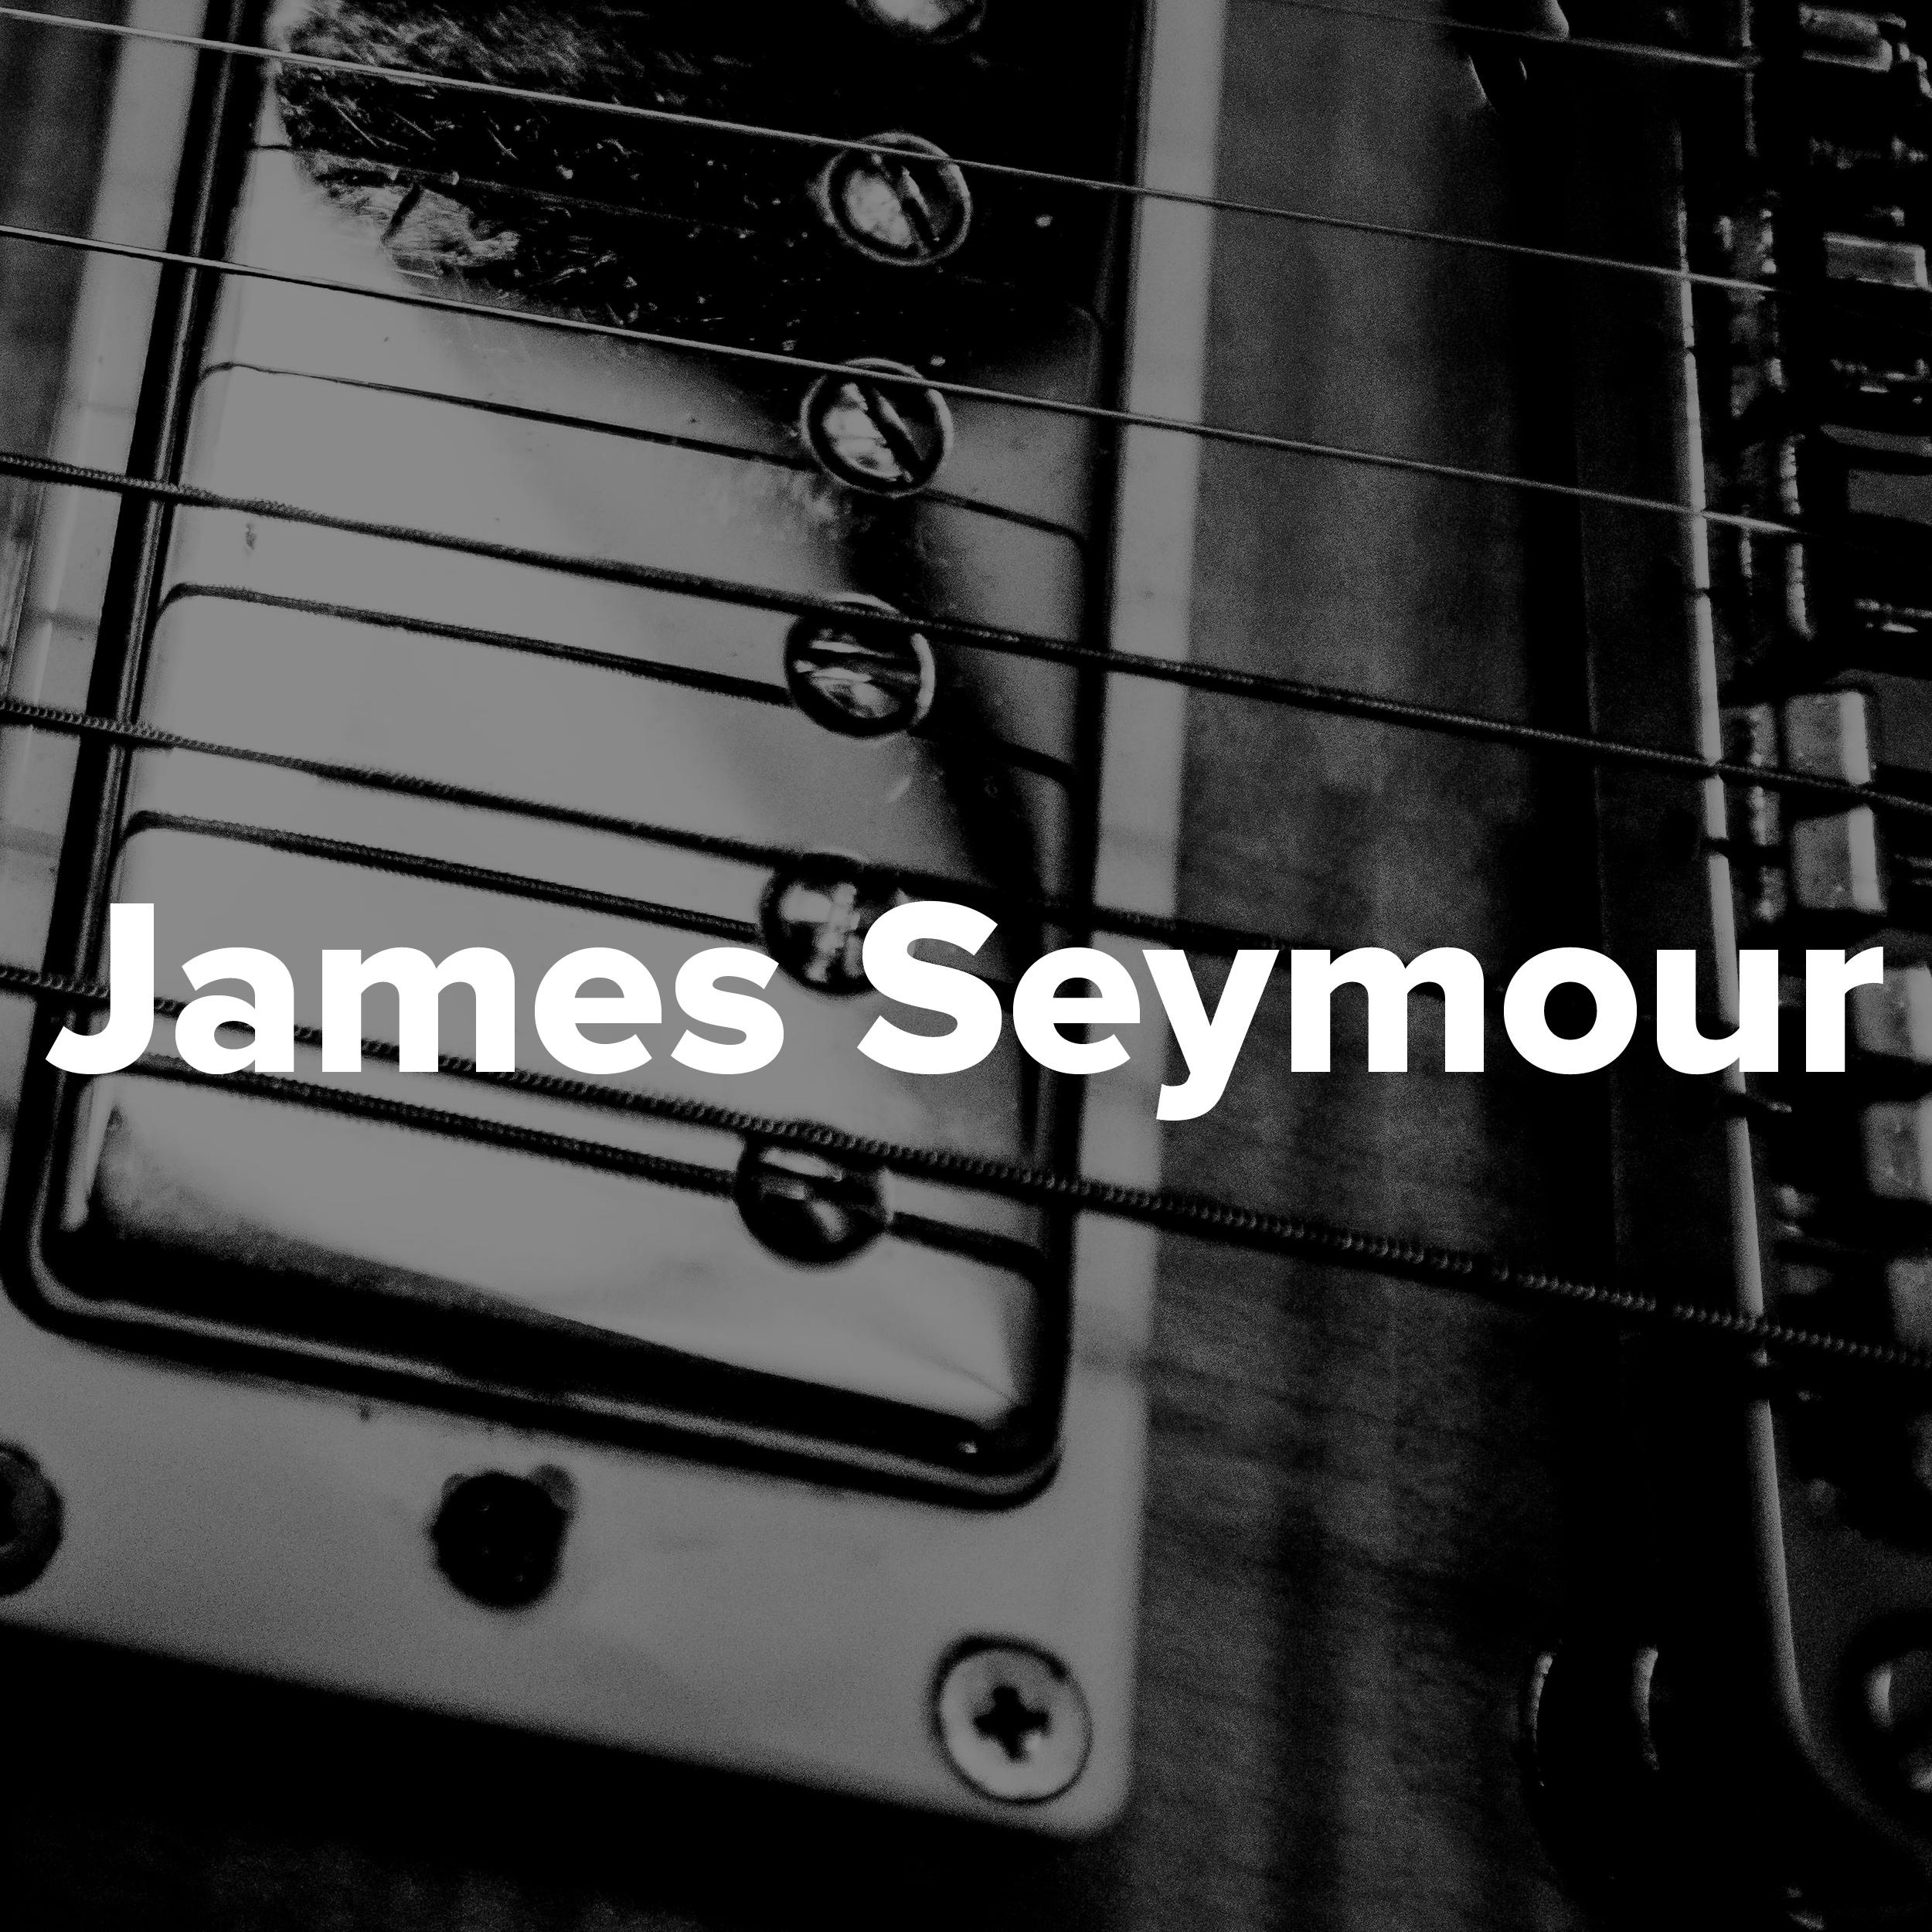 JamesSeymour-01.jpg